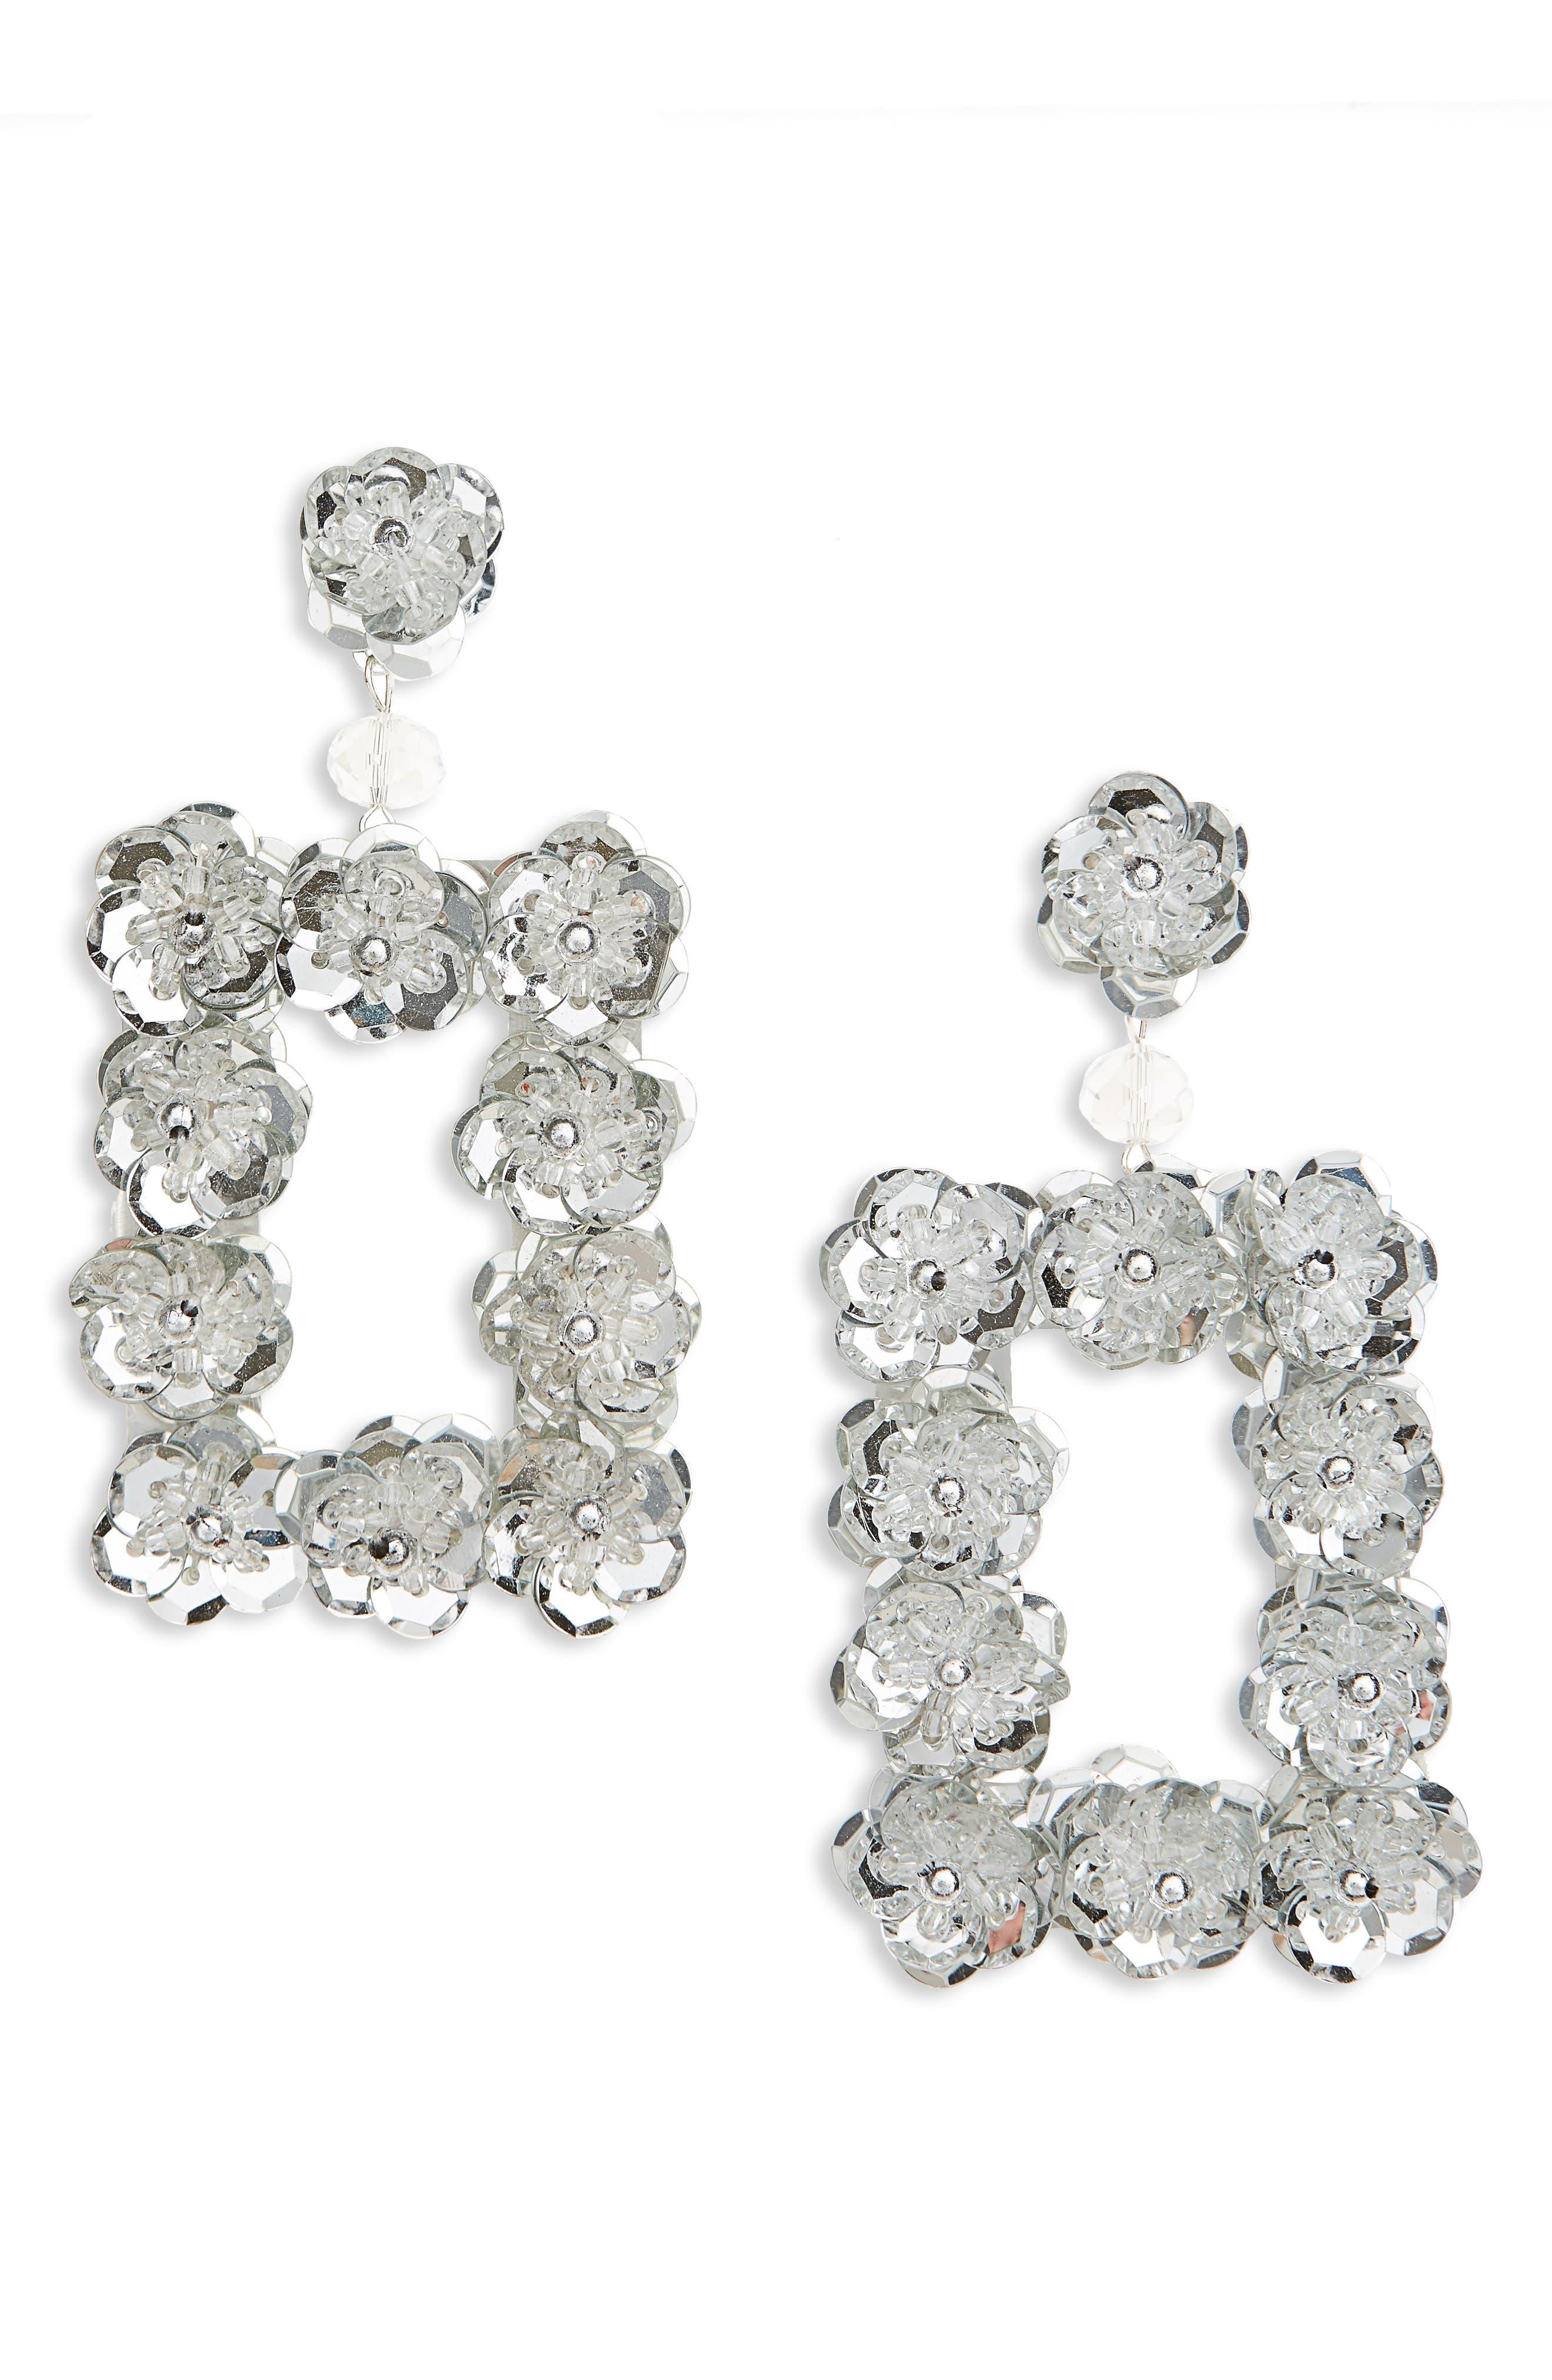 Opulent Floral Square Earrings,                             Main thumbnail 1, color,                             040